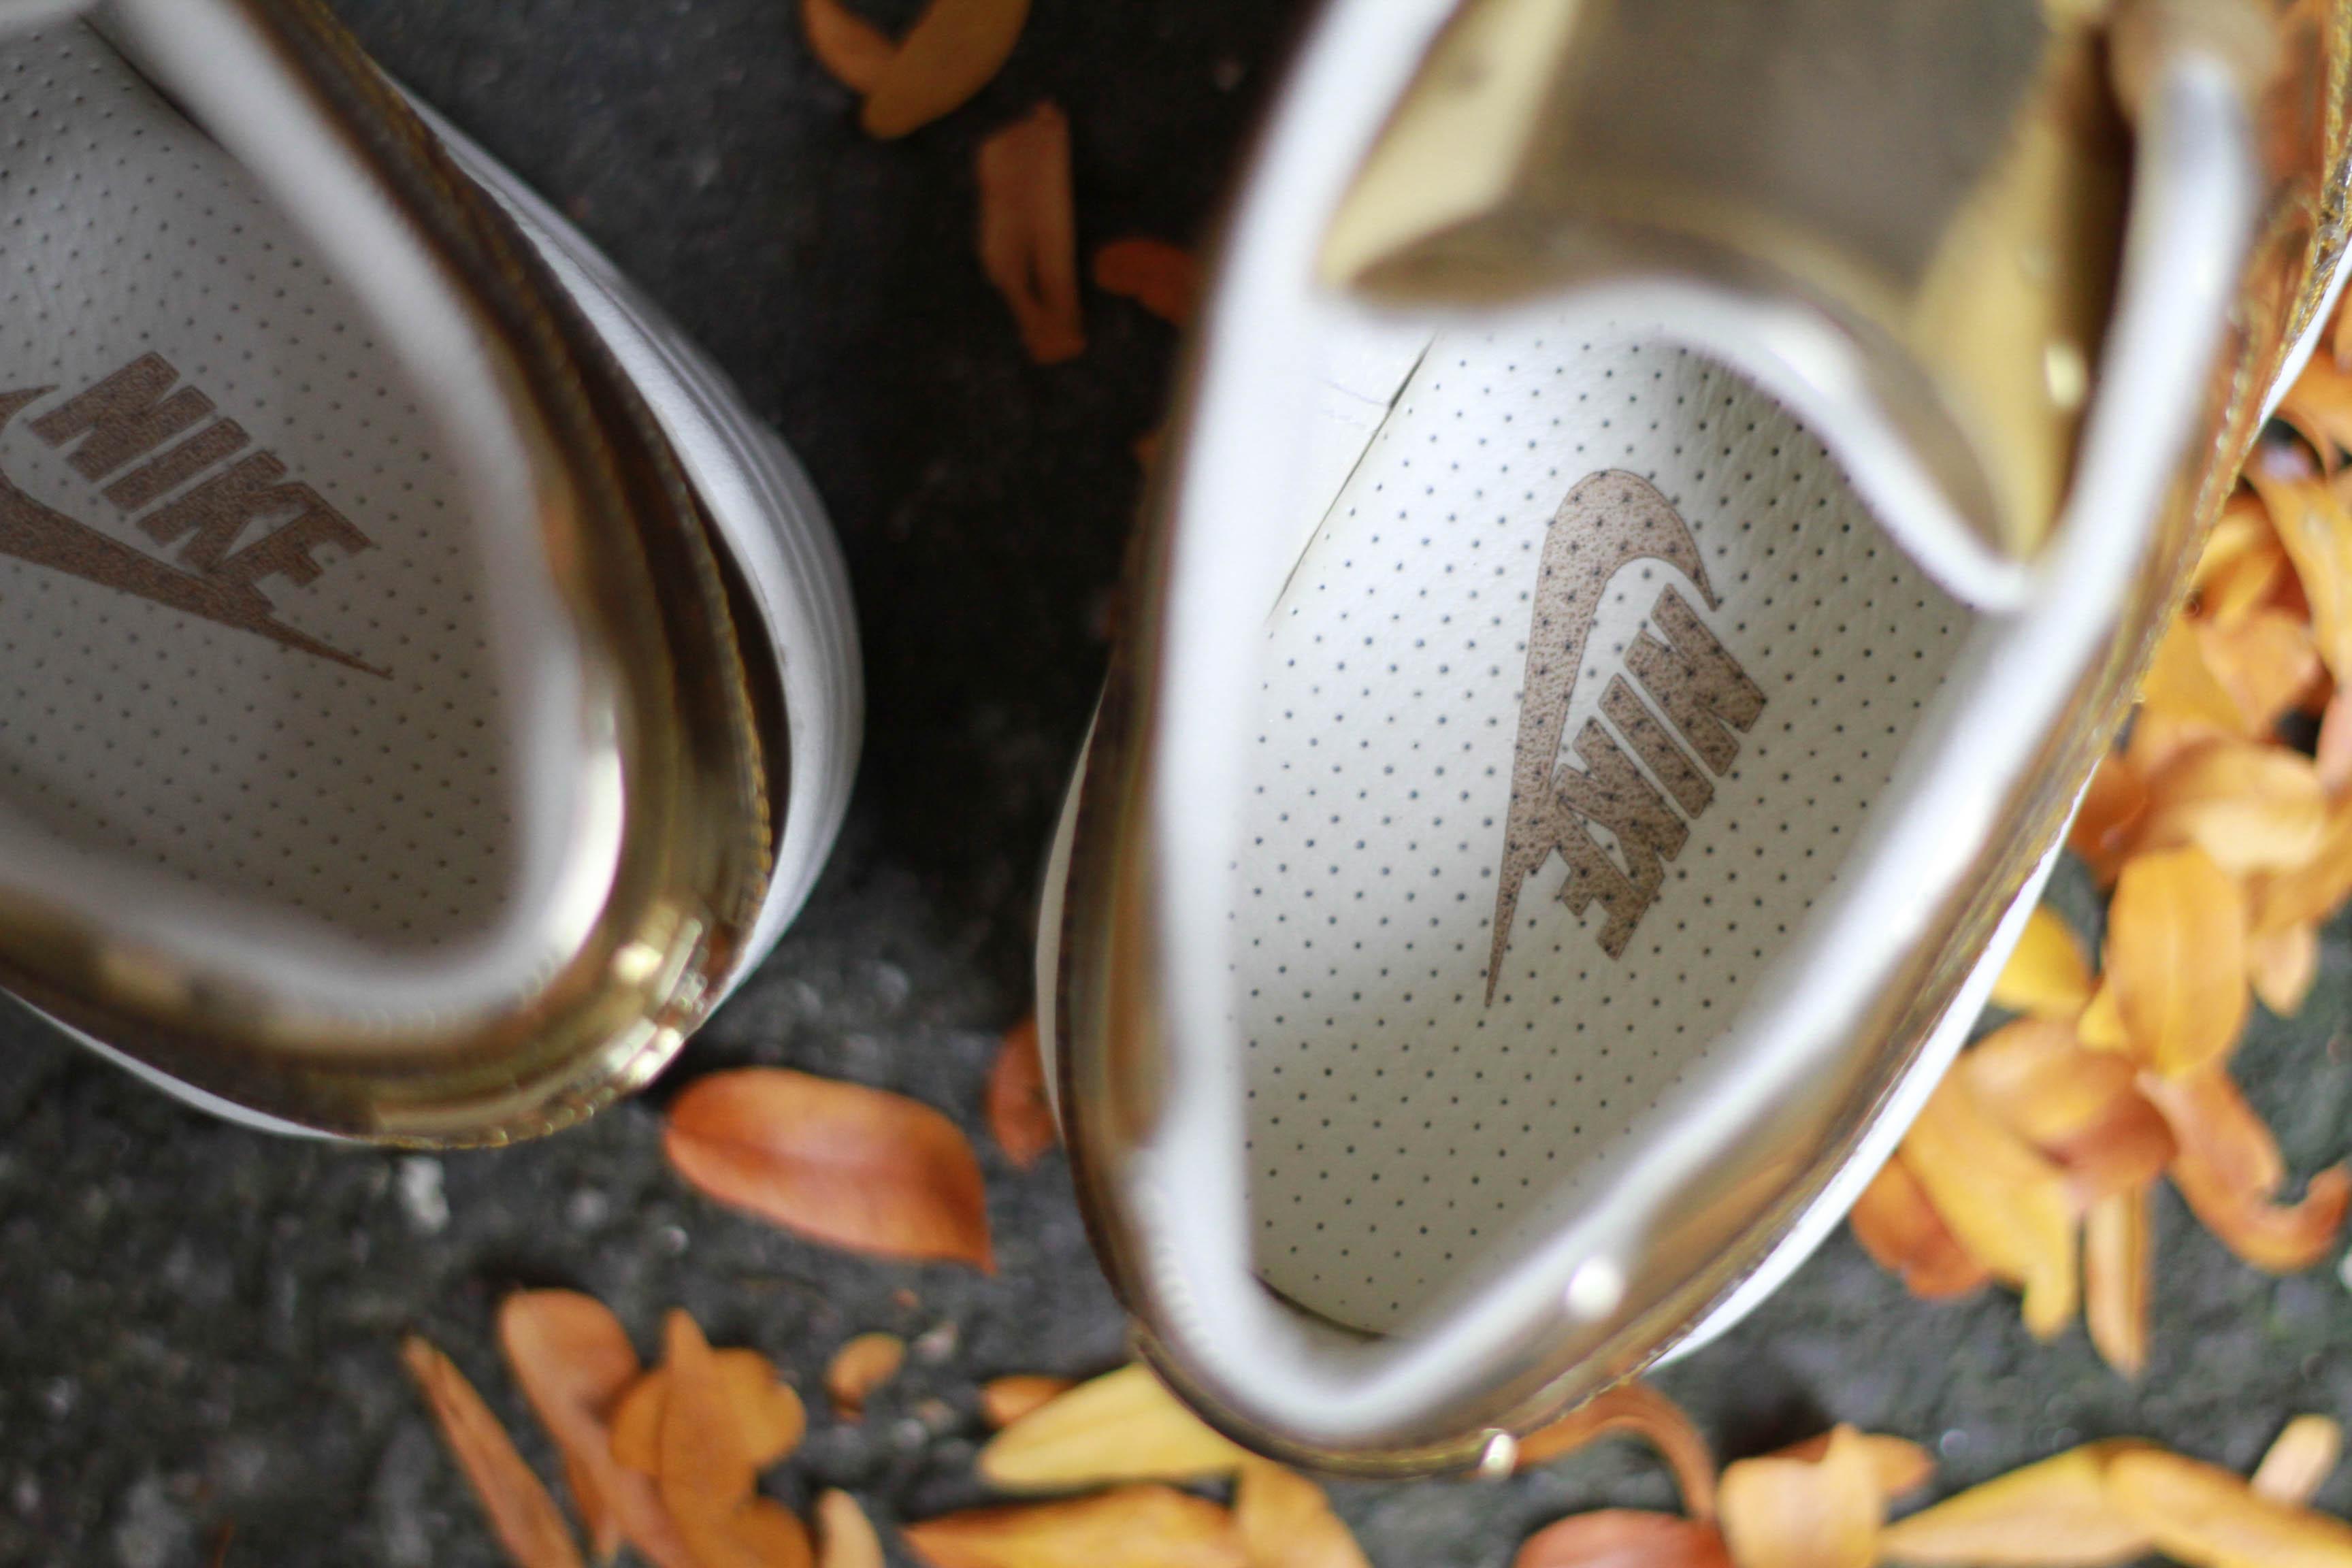 Nike Air Max 1 SP liquid metal detail